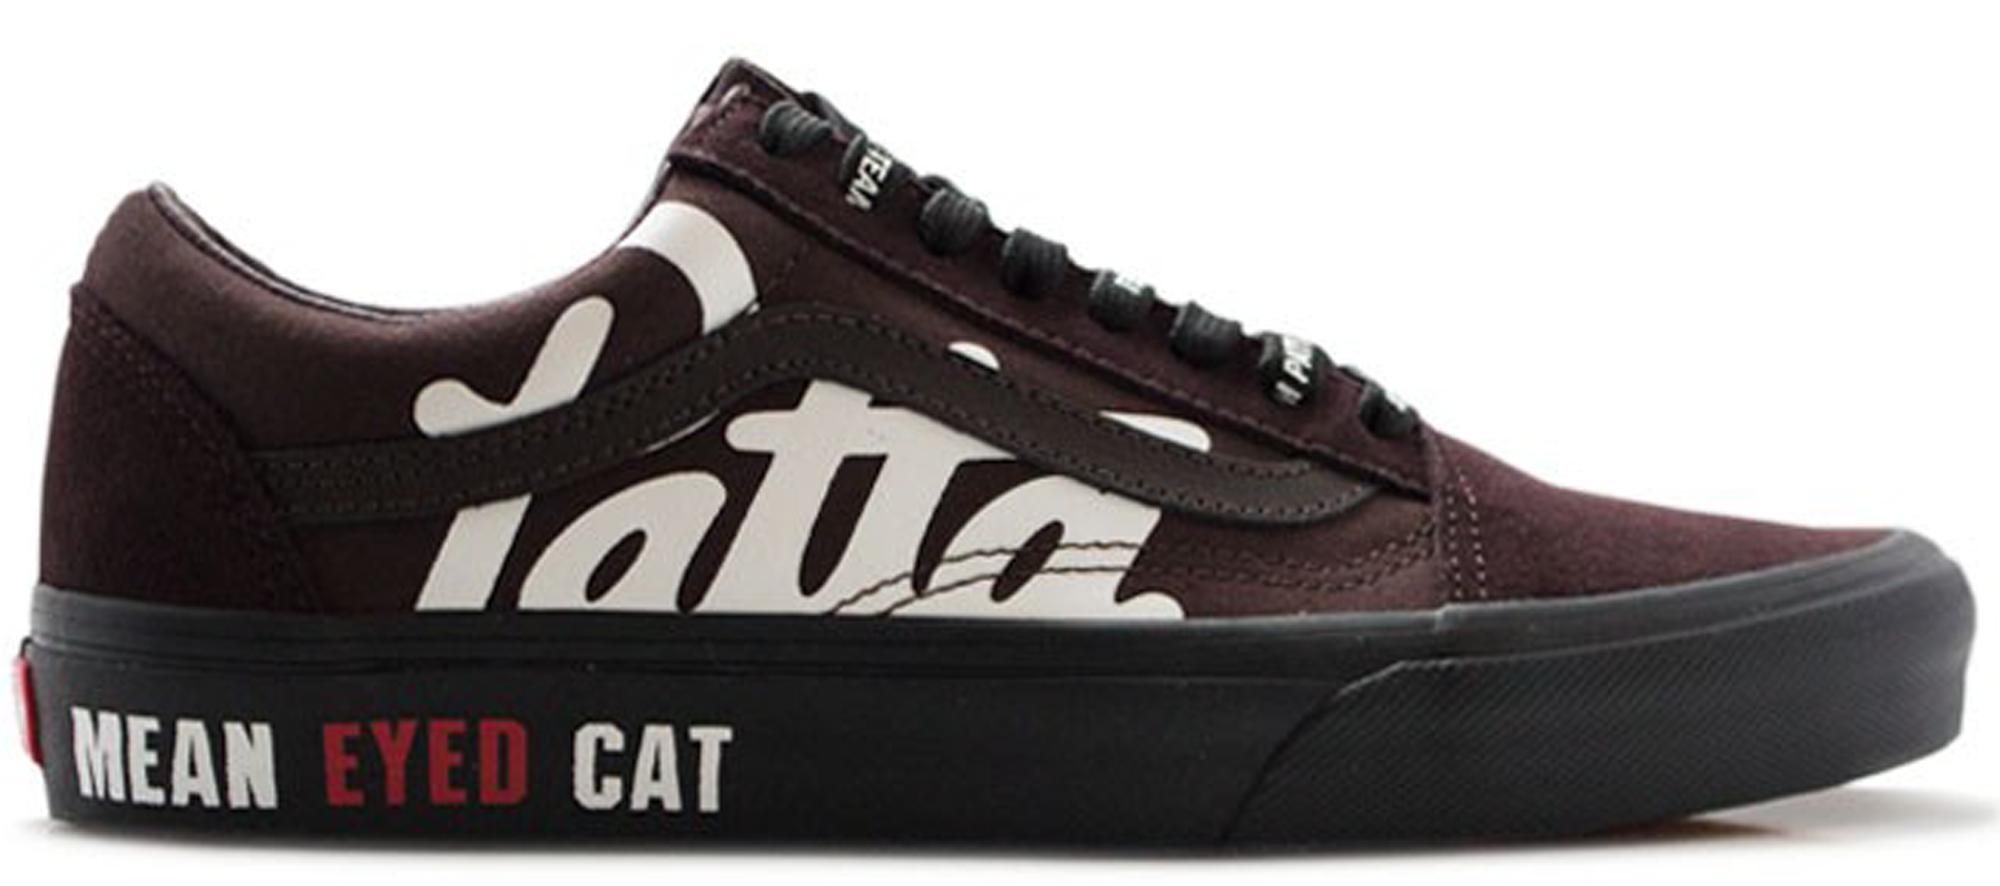 Old Skool Patta Mean Eyed Cat Coffee